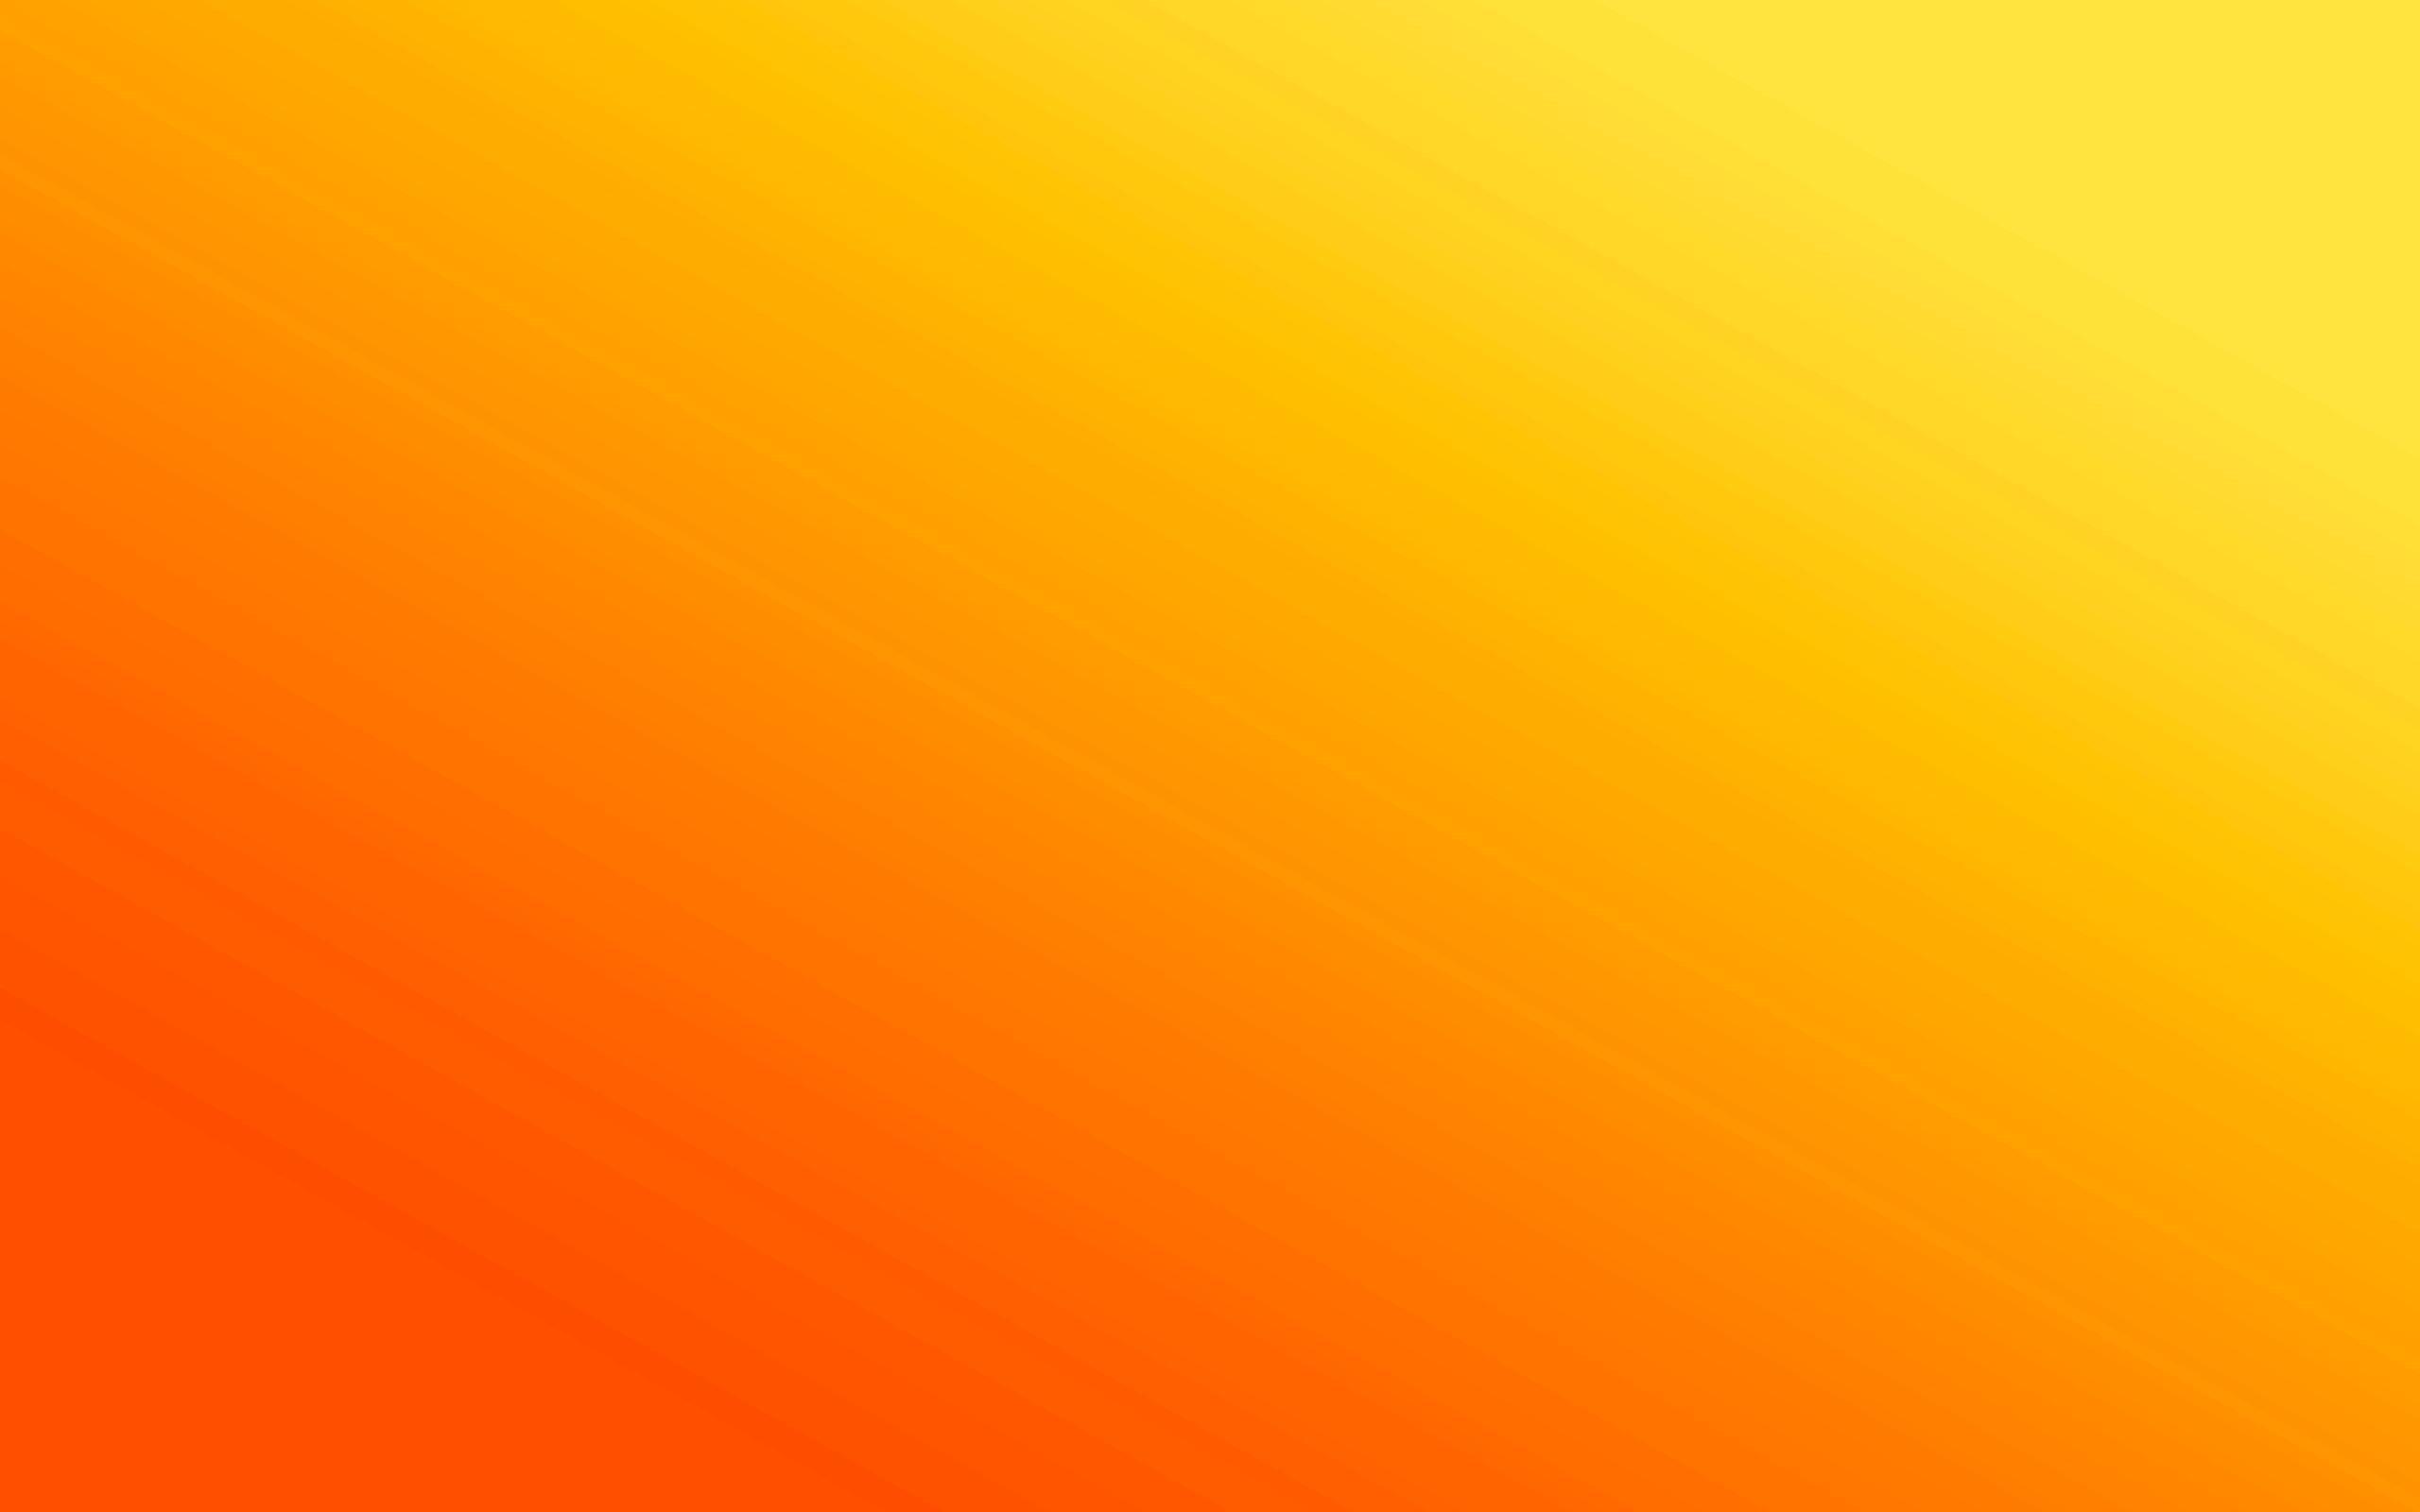 … Orange Wallpaper (20) …